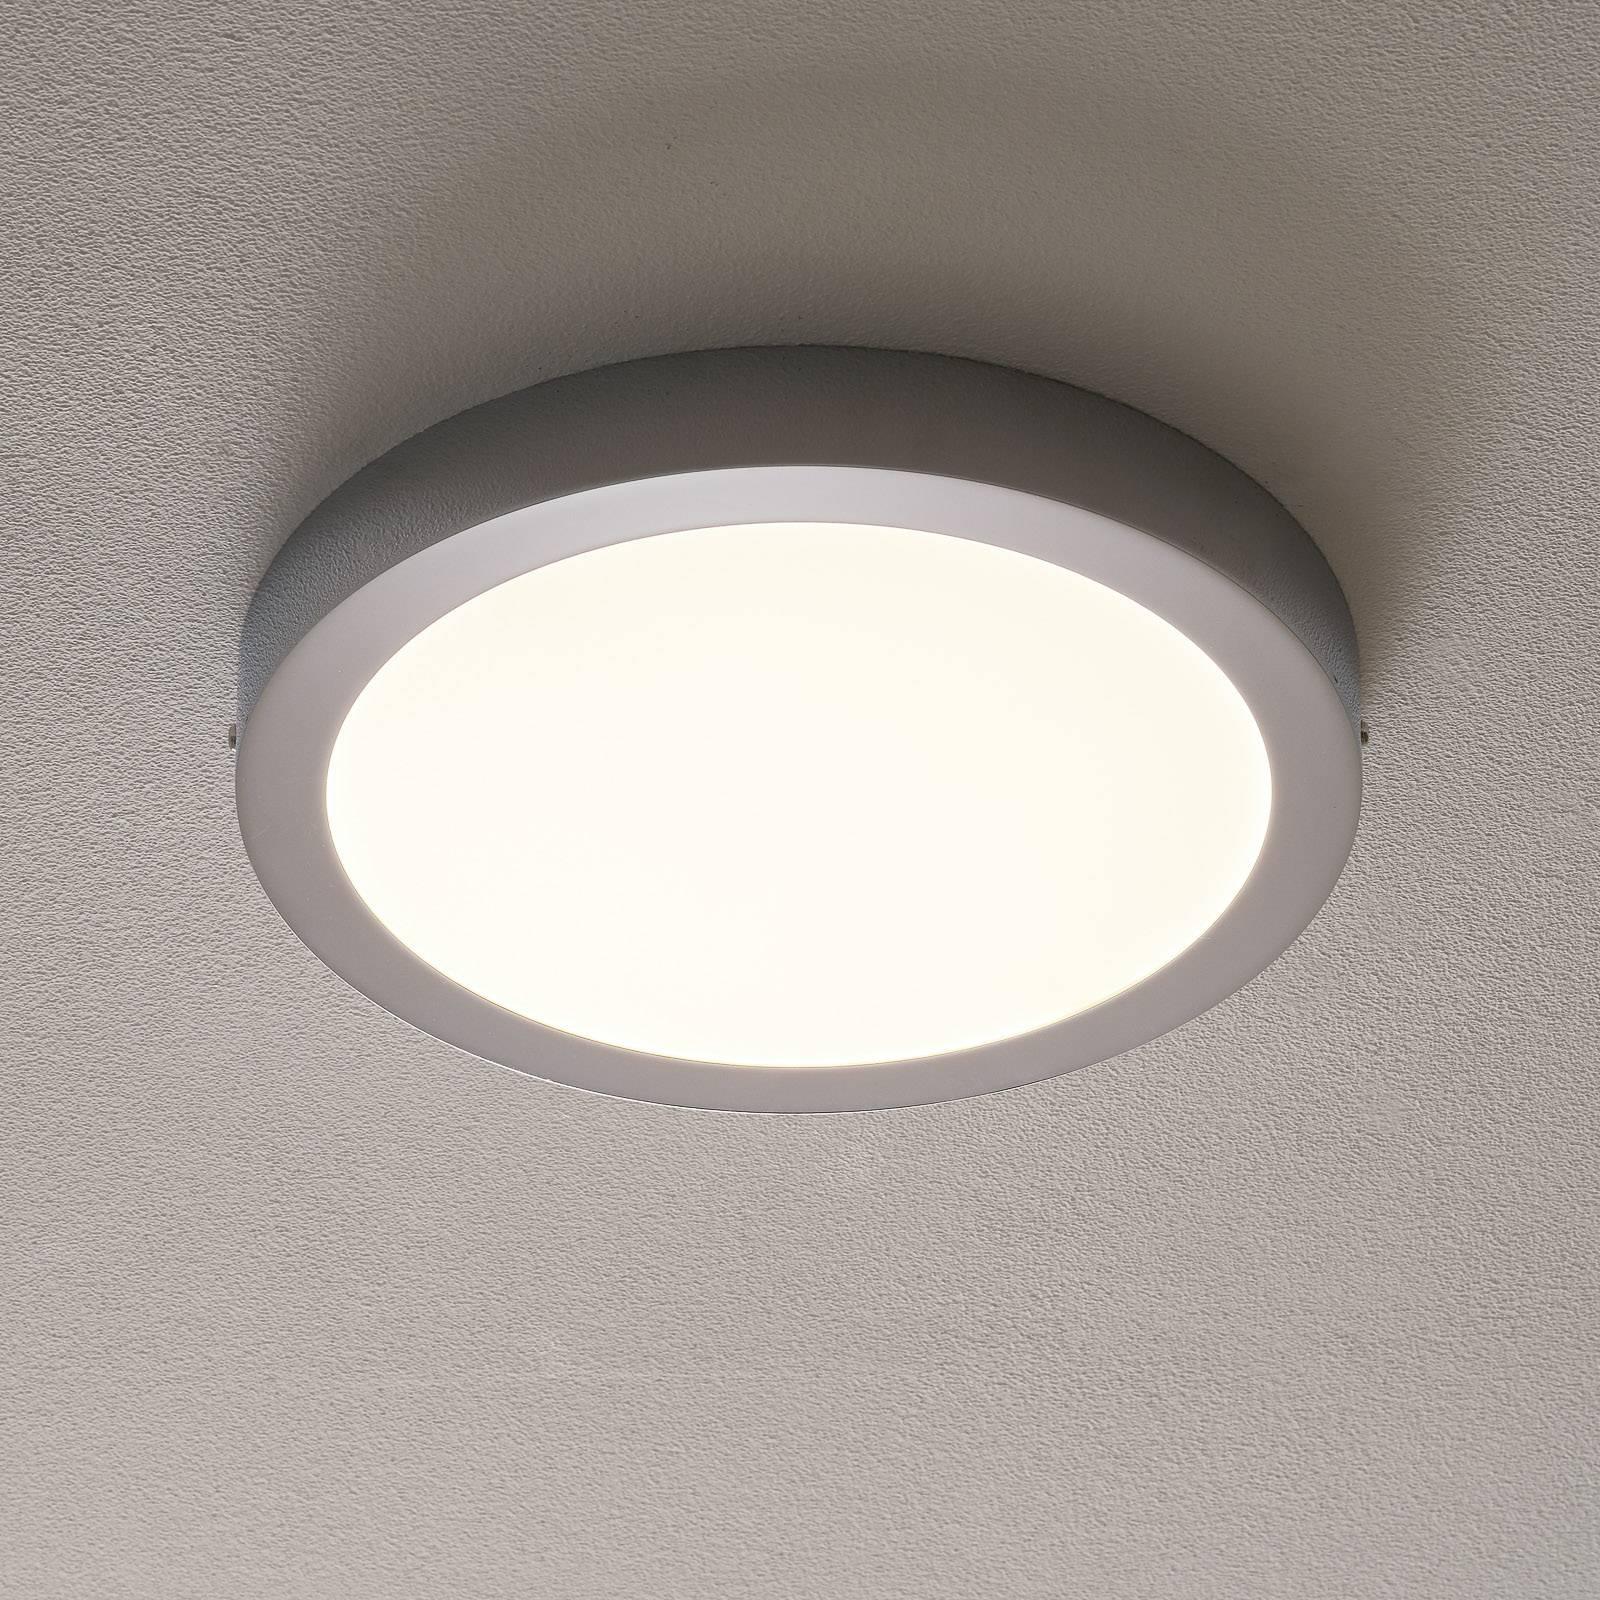 EGLO connect Fueva-C lampa sufitowa okrągła 30 cm